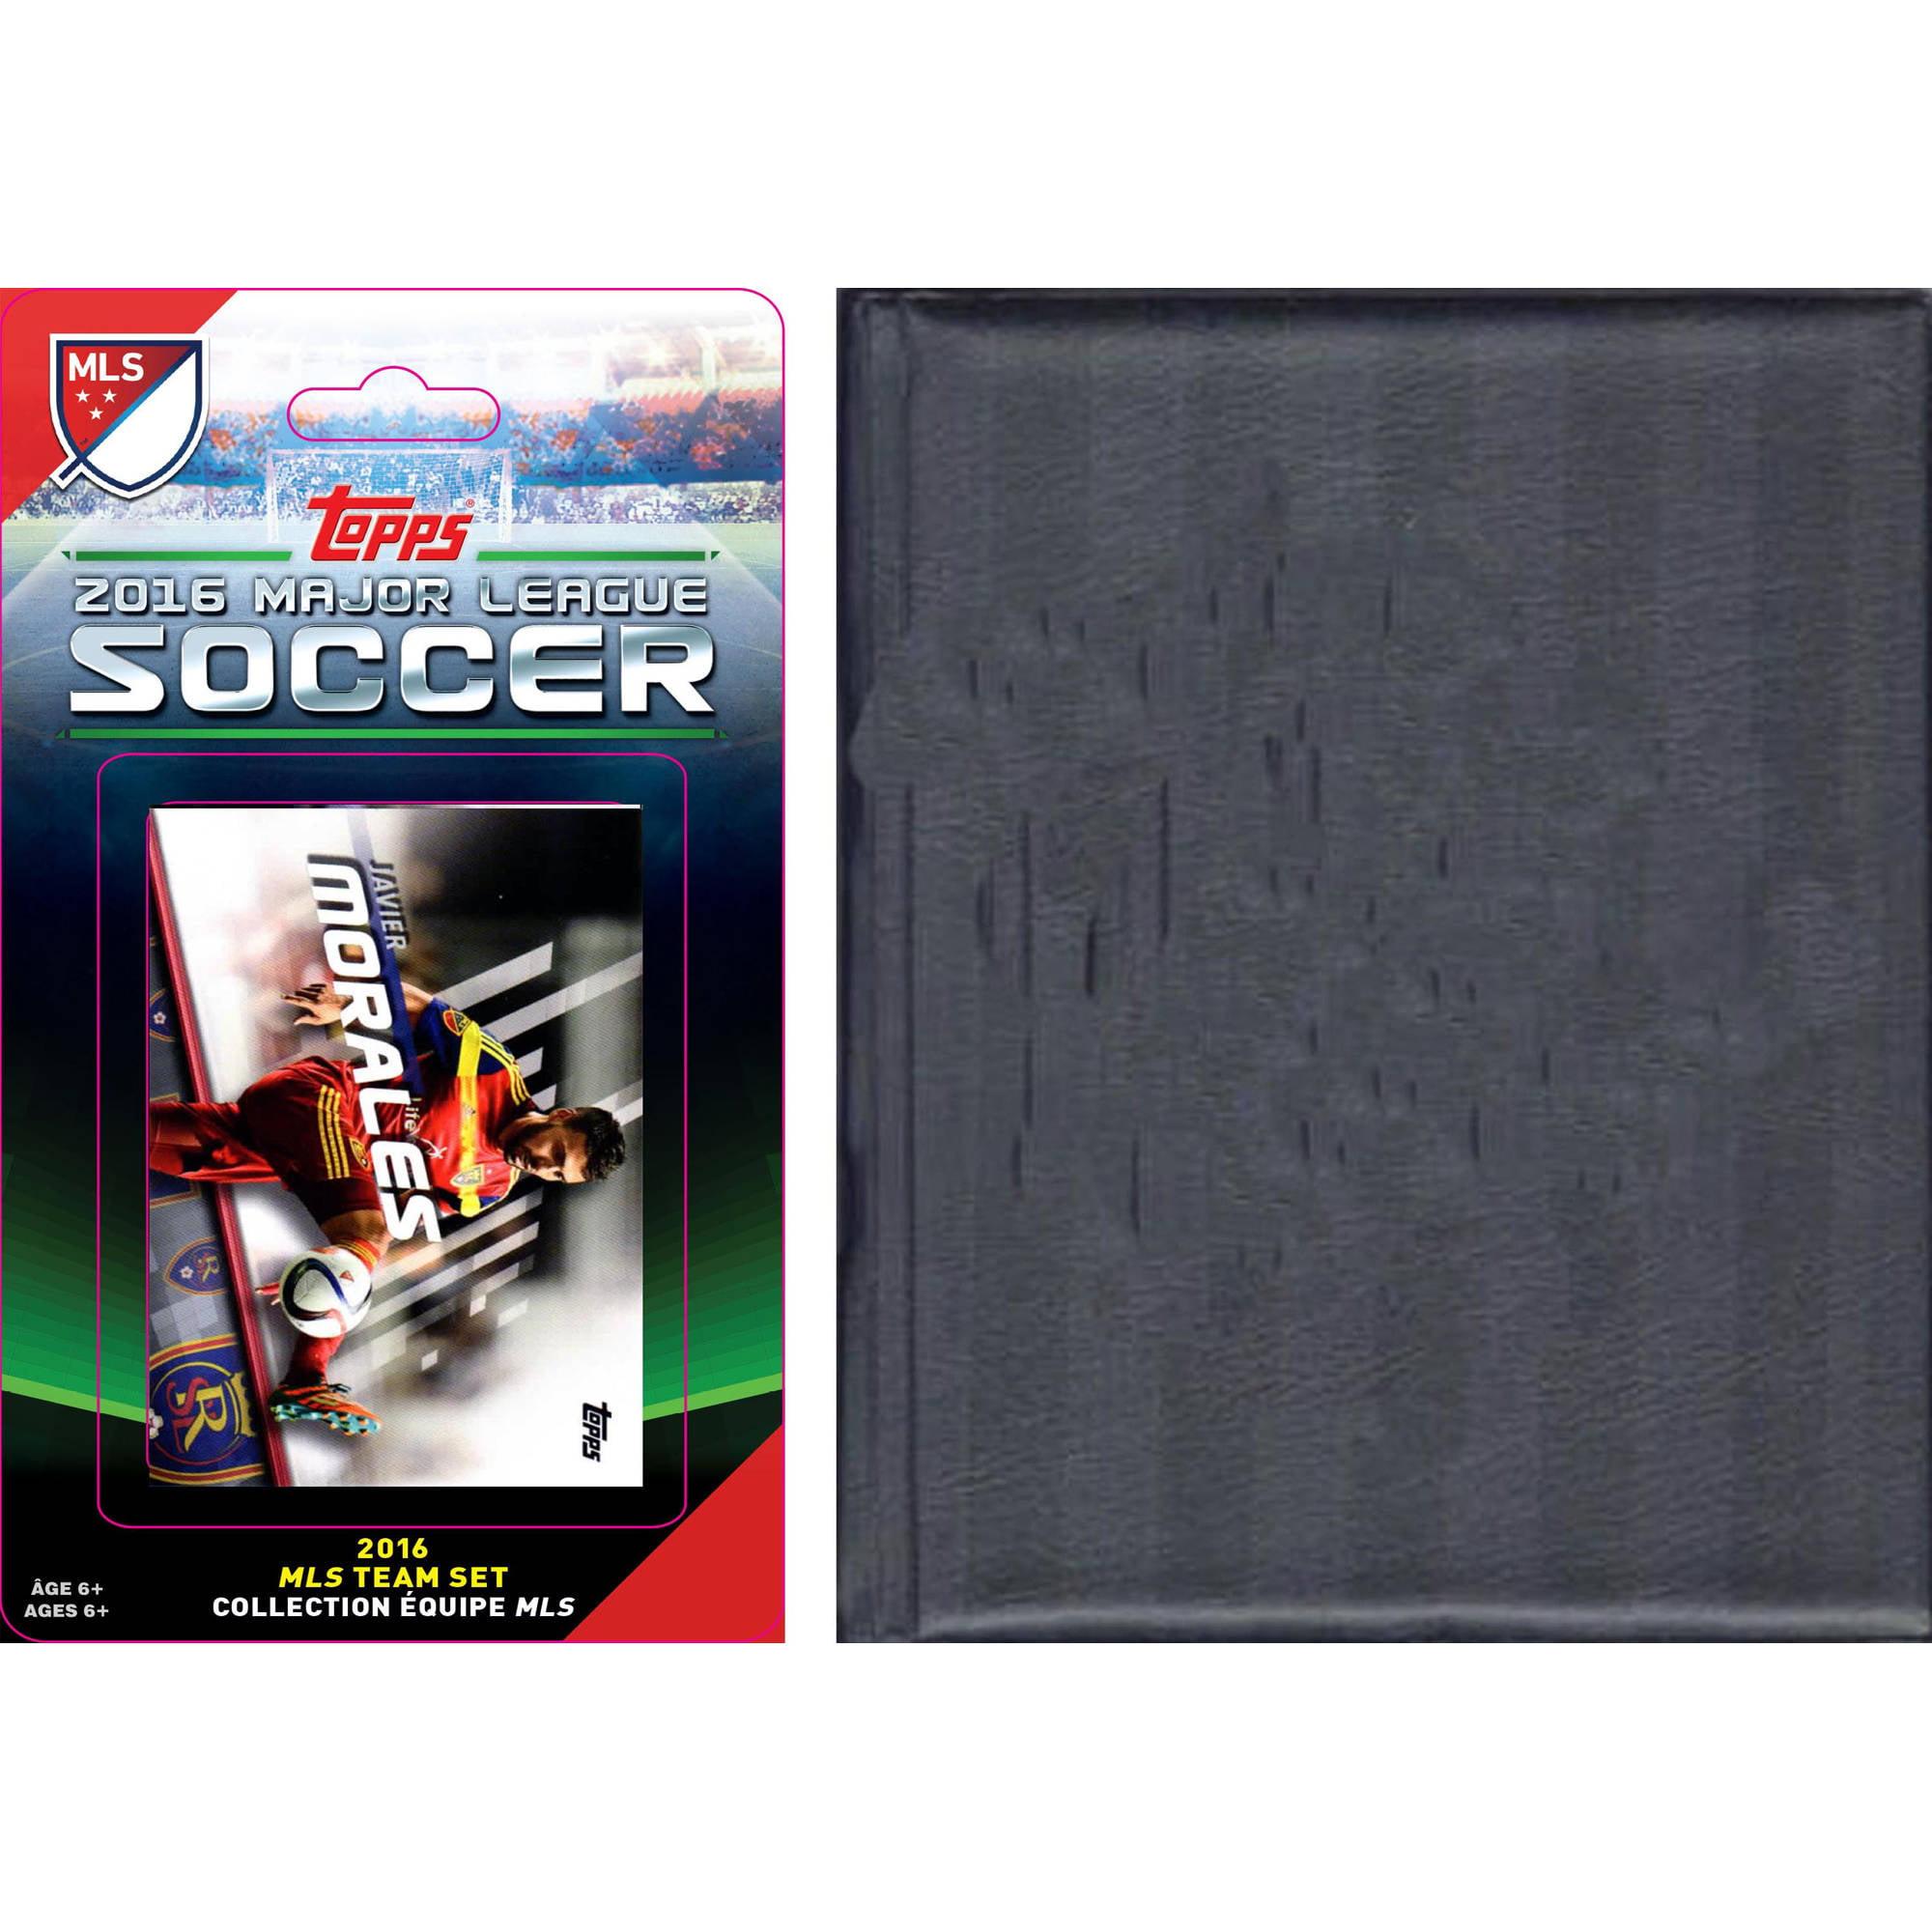 C&I Collectables MLS Real Salt Lake Licensed 2016 Topps Team Set and Storage Album